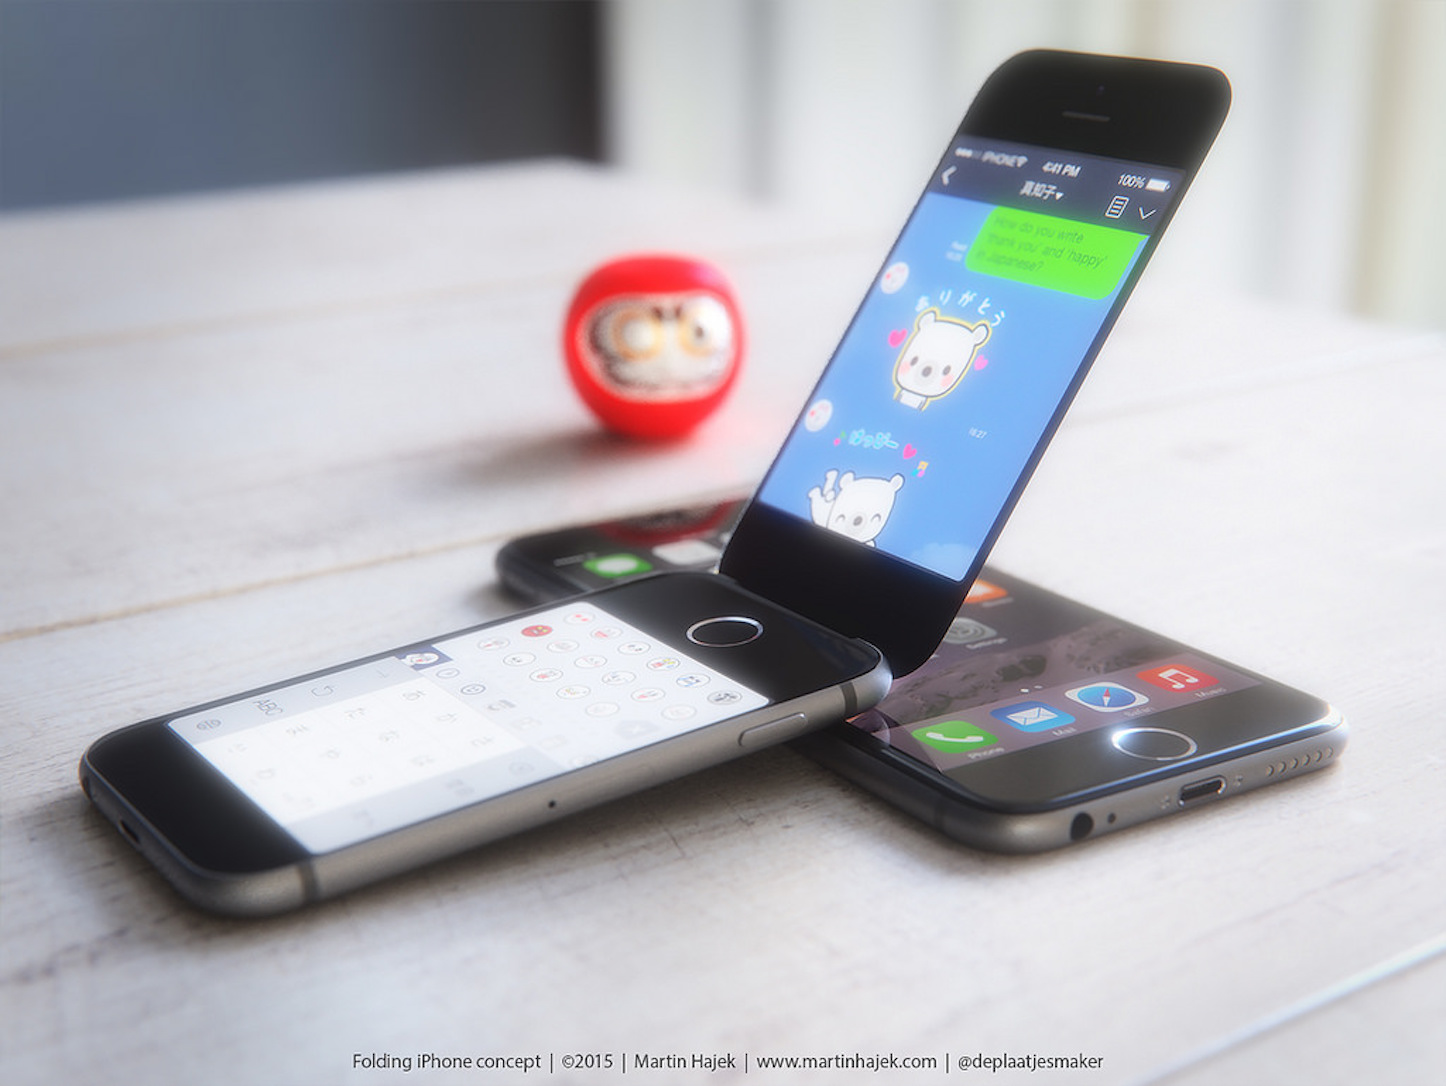 Feature-Phone-Apple-Martin-Hajek-2.jpg